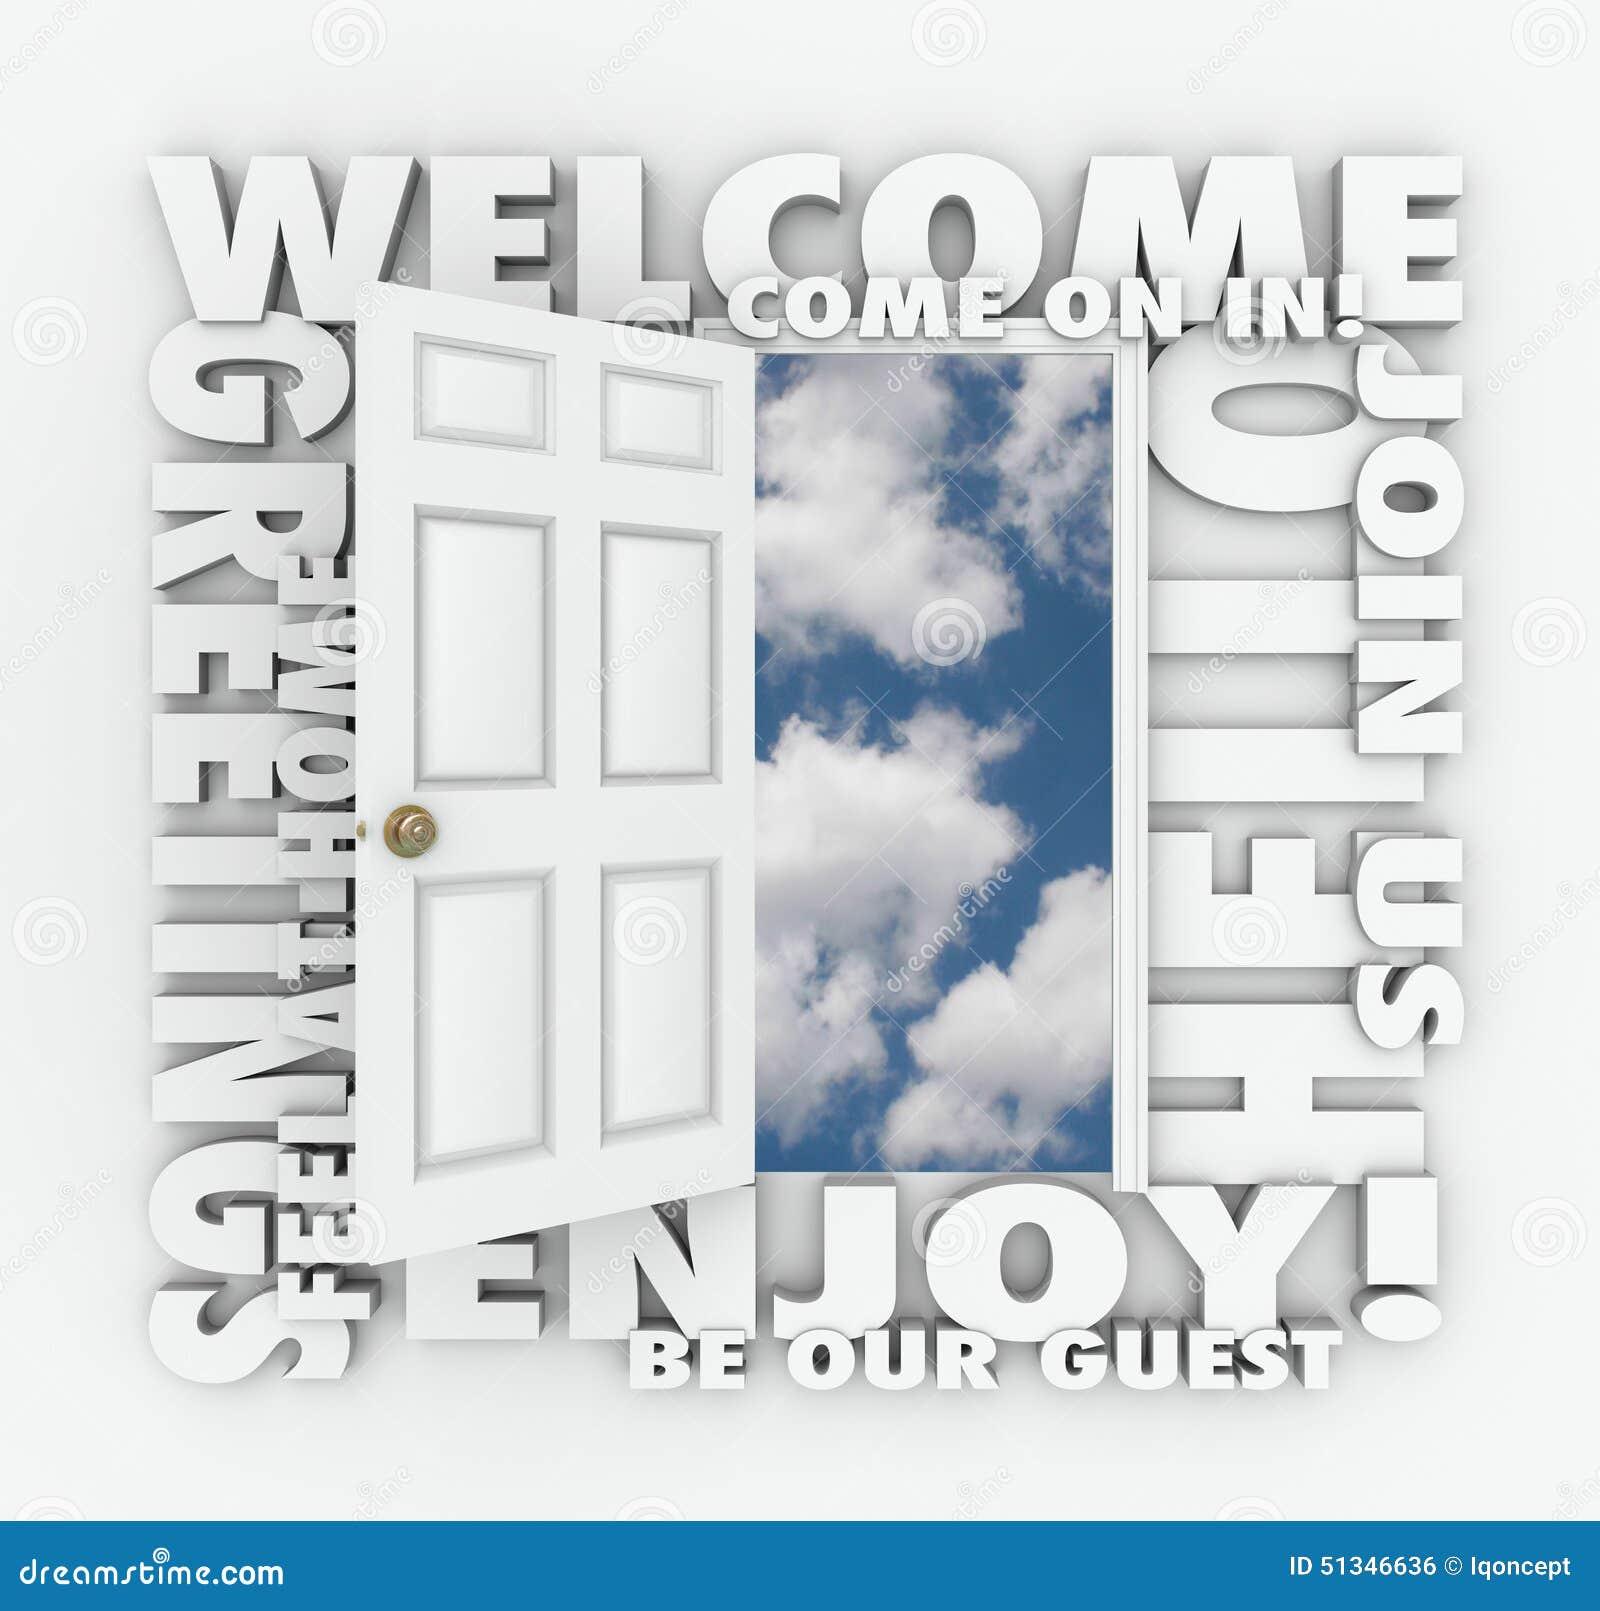 Welcome open door hello friendly service guest invitation words welcome open door hello friendly service guest invitation words stopboris Image collections